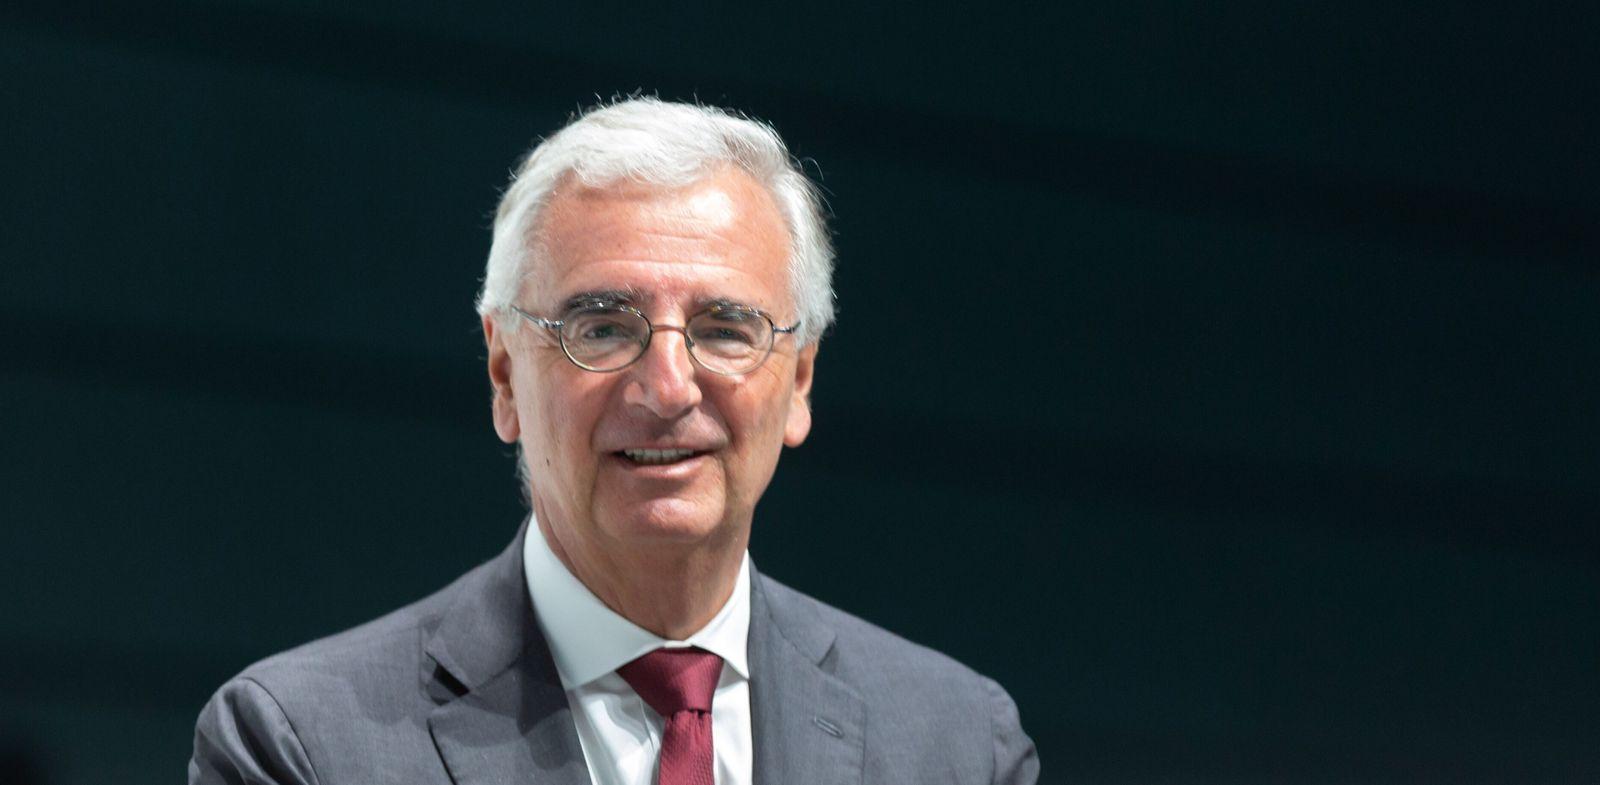 Bonn, Germany, April 26 2019, Bayer AG annual general meeting: Member of the supervisory board Paul Achleitner. (Jürgen Schwarz)